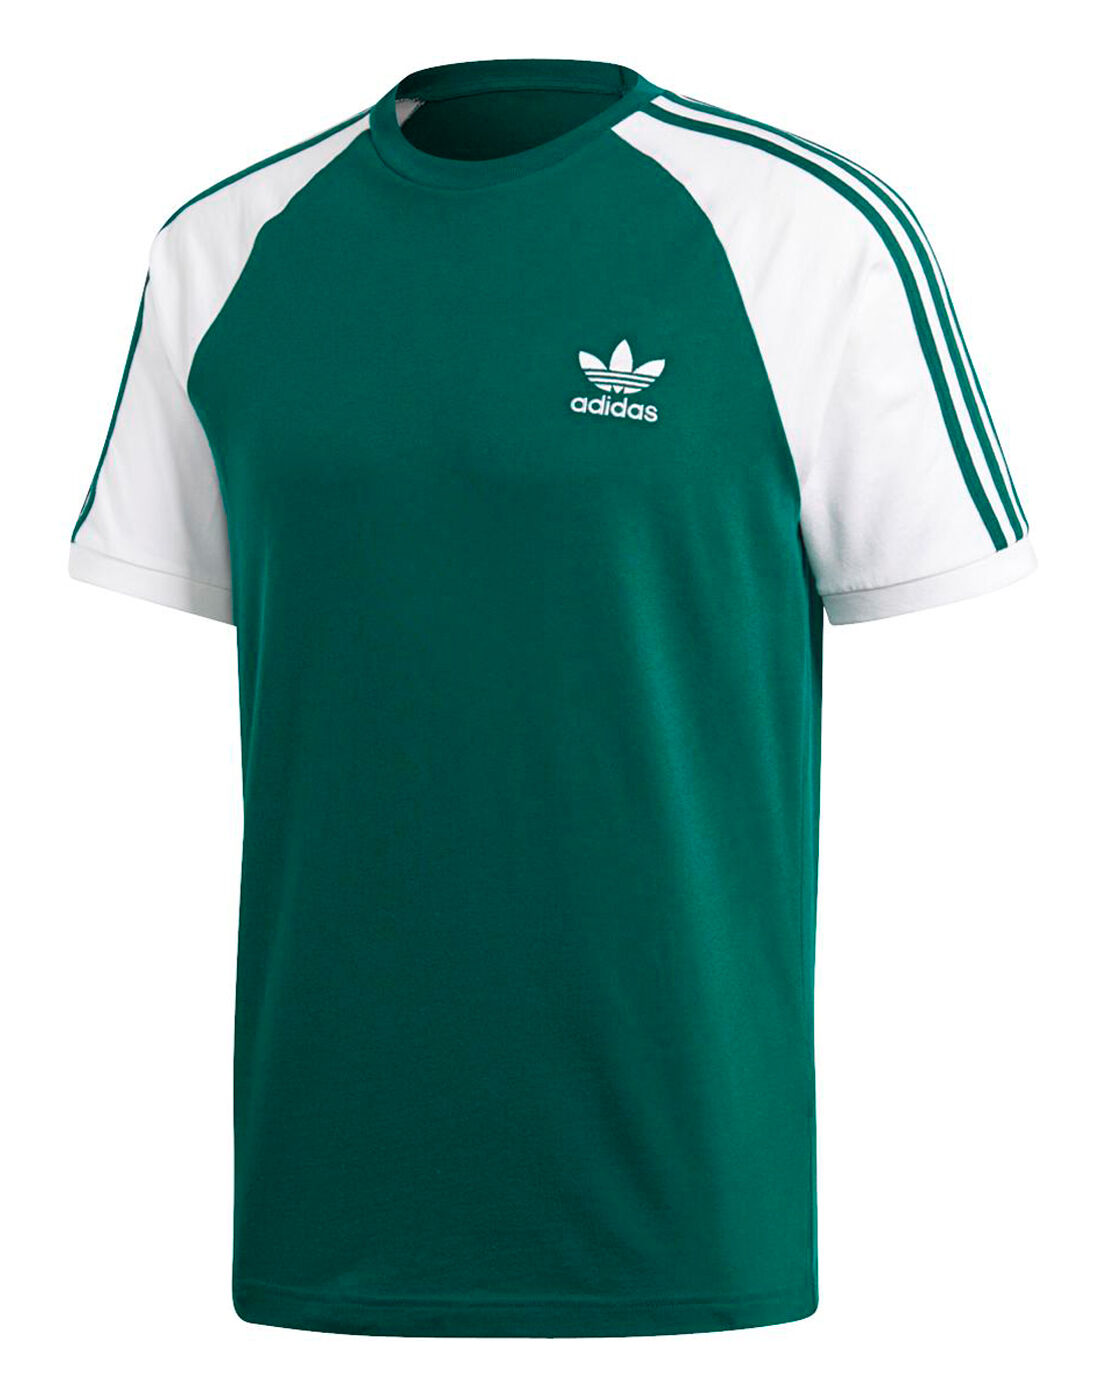 adidas originali mens 3 strisce tee green life style sport